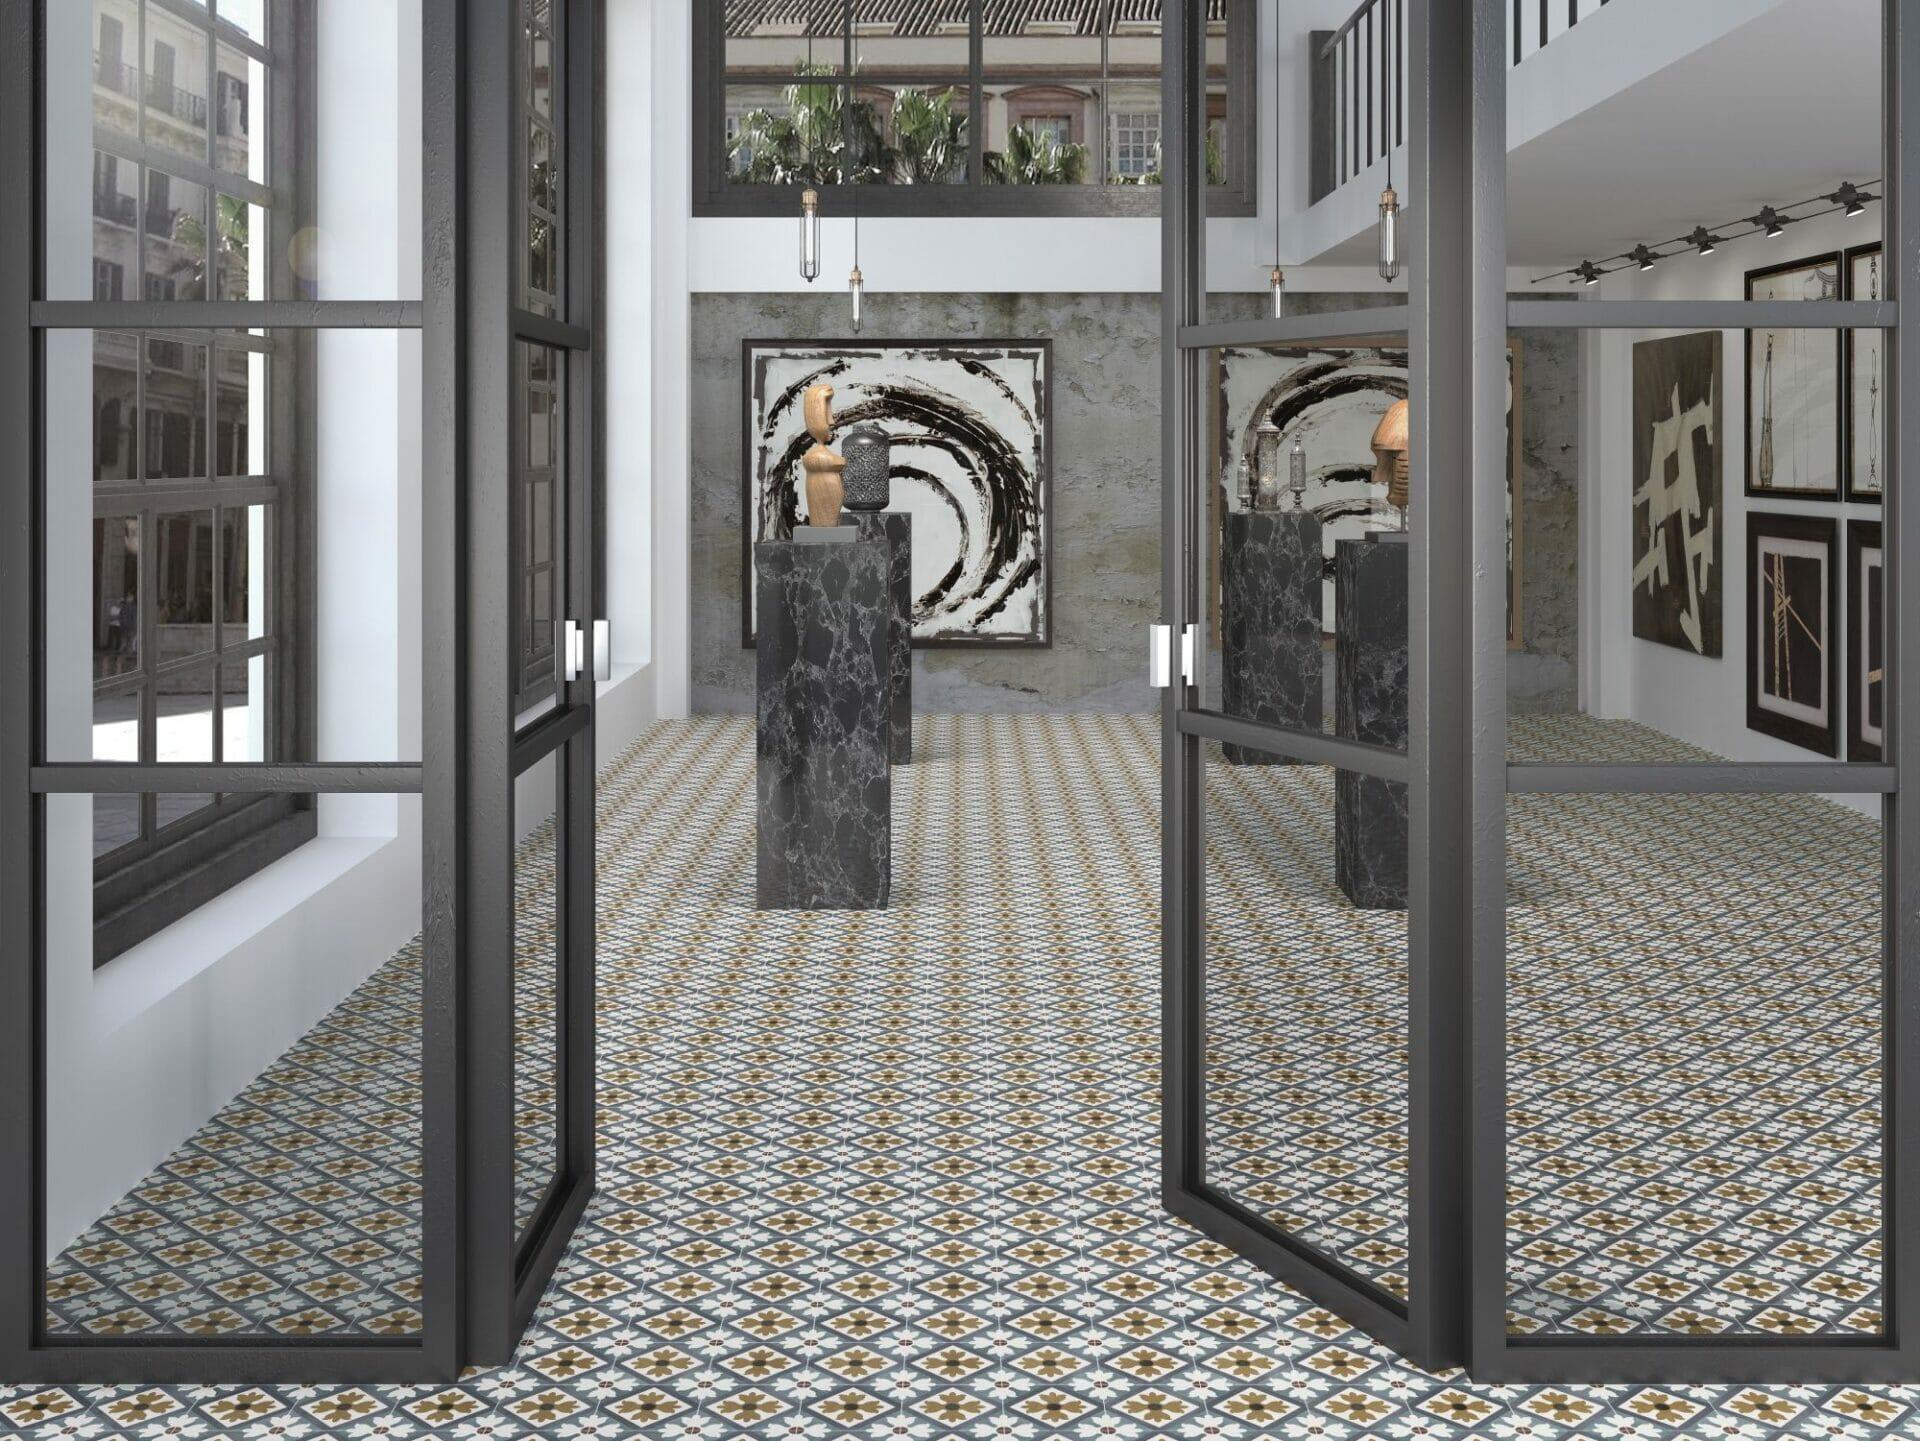 floriane-sweet-carole-carmen-tiles-patterned-flooring